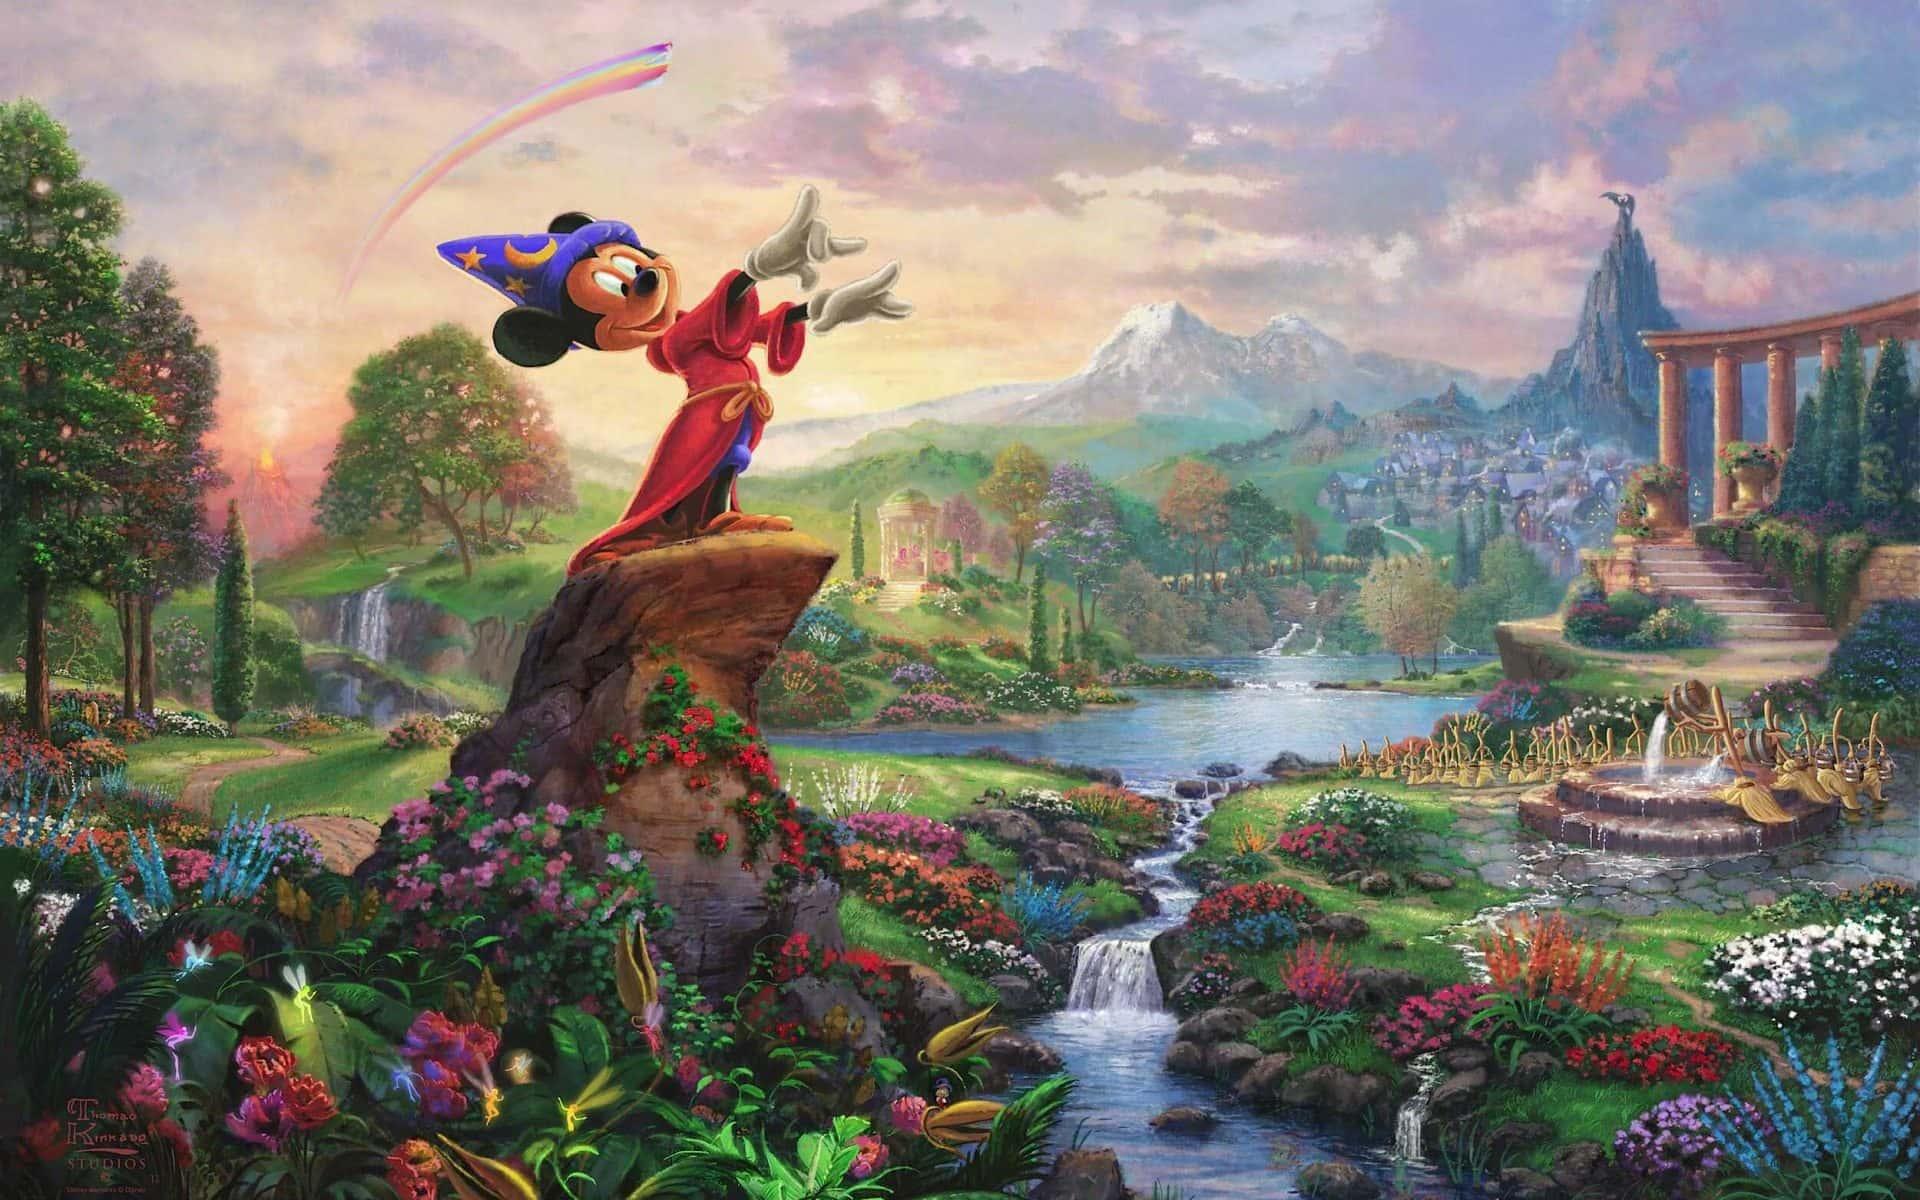 Disney Movie Facts